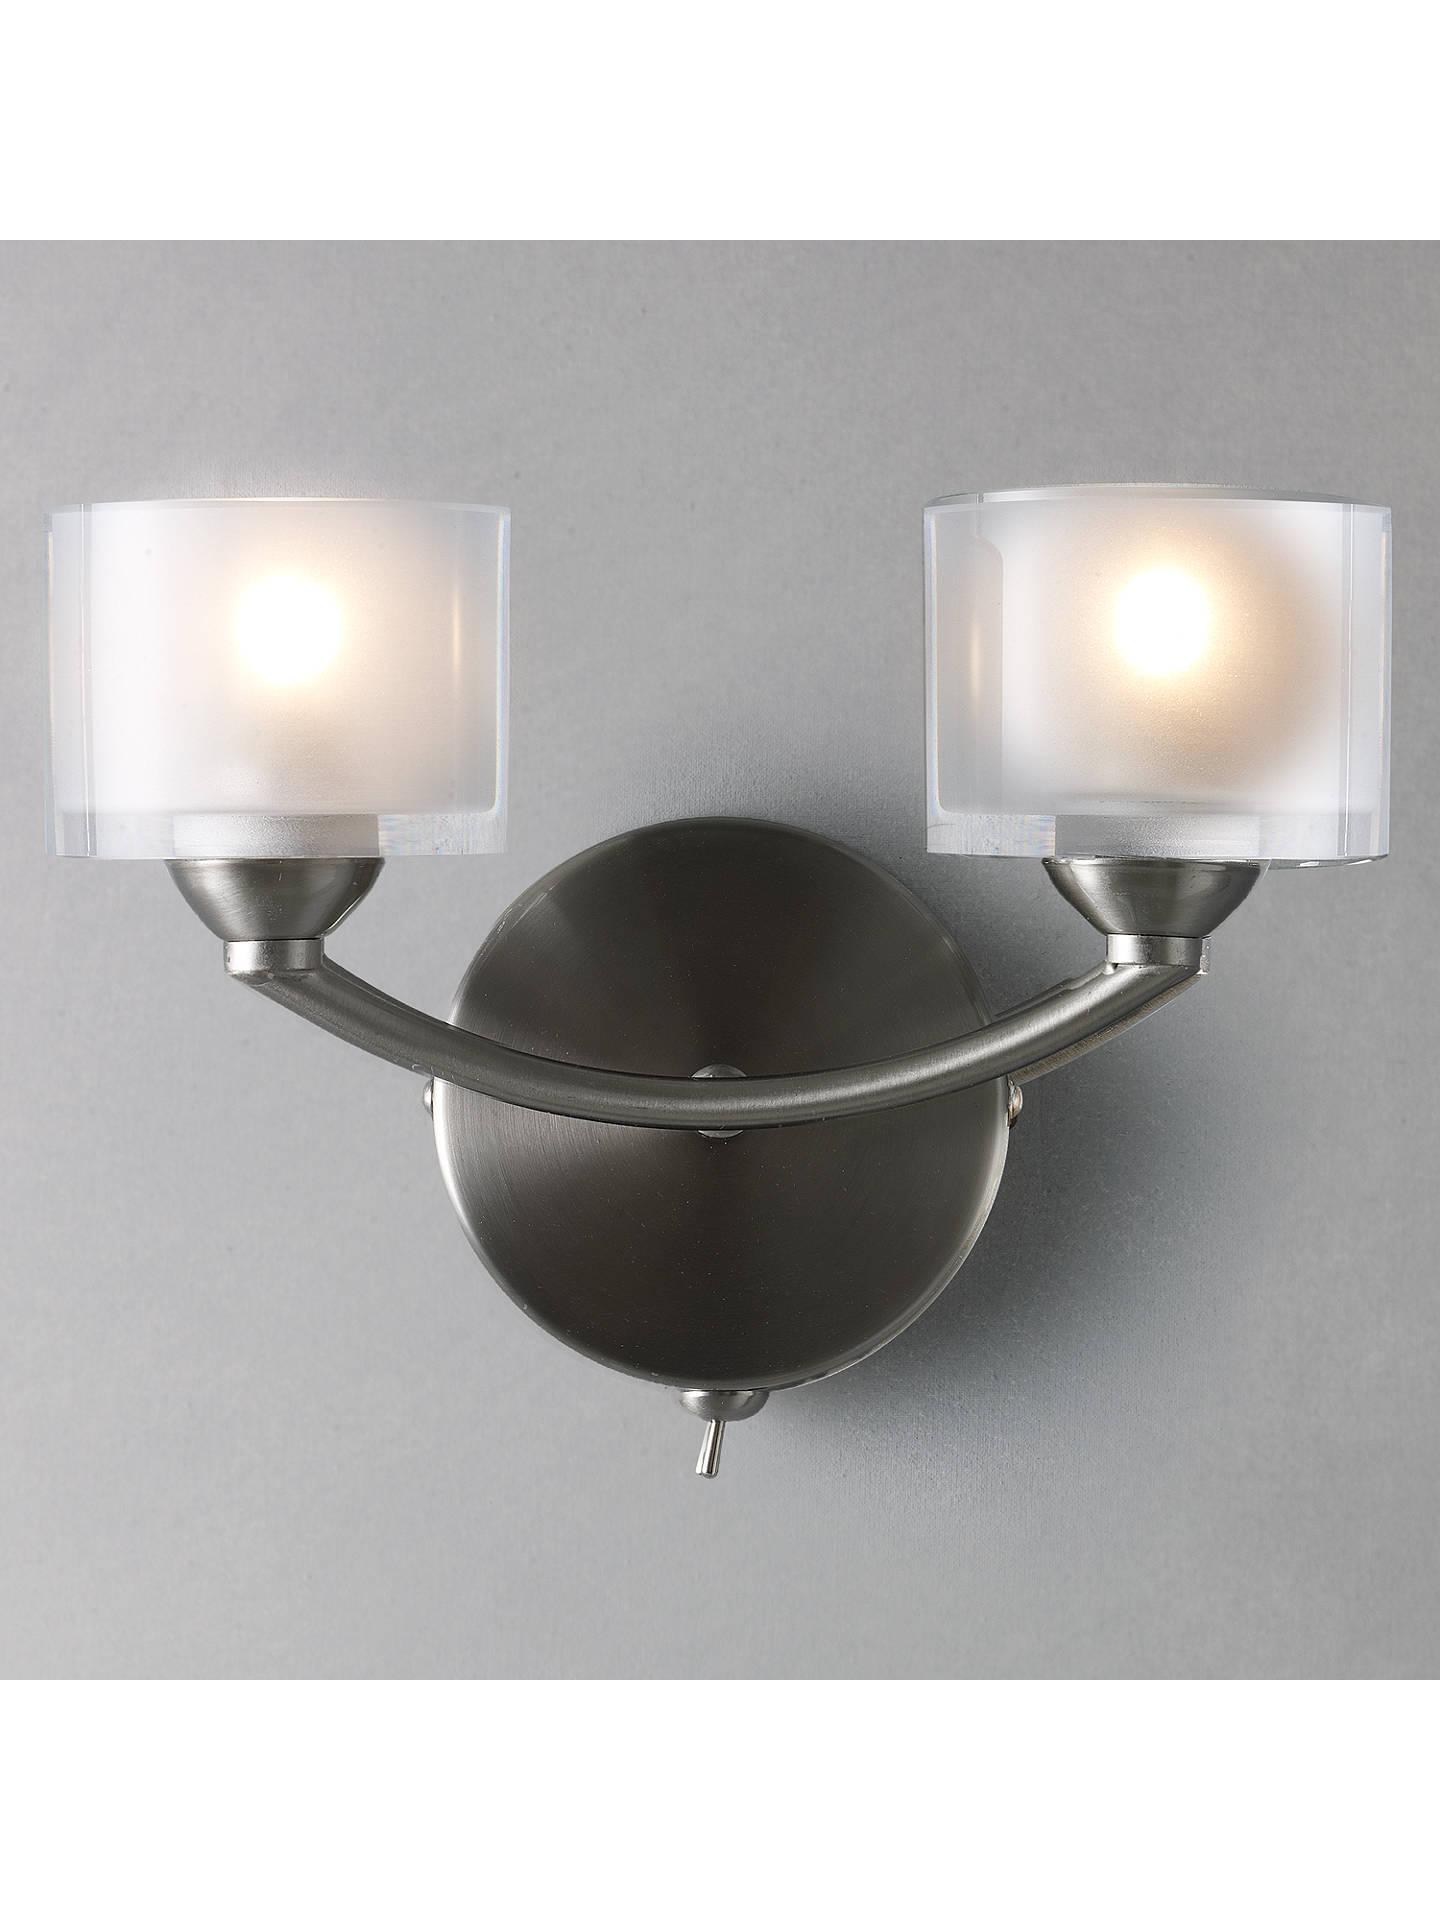 Modern Satin Grey Ceramic Planter Style Flush Wall Lamp with Light Filtering Uplighter Design Home & Kitchen Home & Garden Store